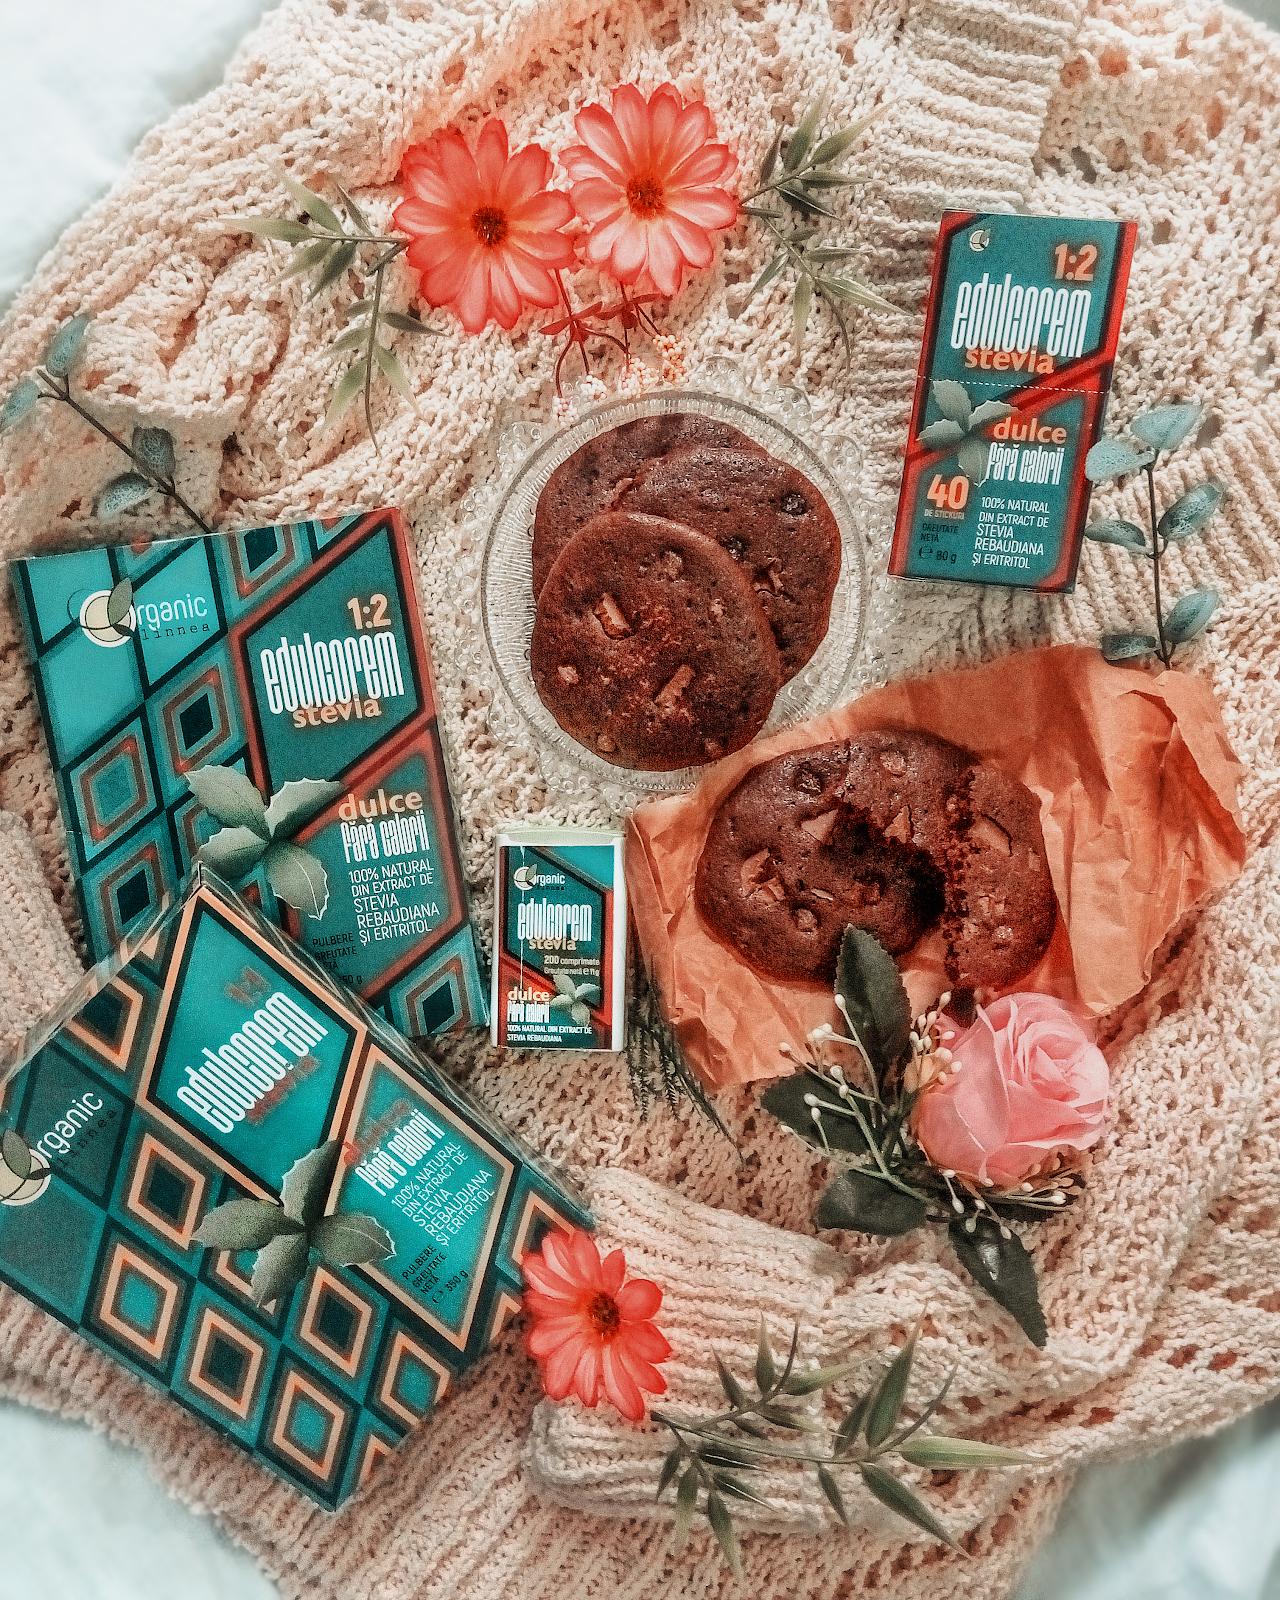 Edulcorem stevia nosugarshop - reteta cookies prajitura fursec biscuiti ciocolata cafea scortisoara pareri review